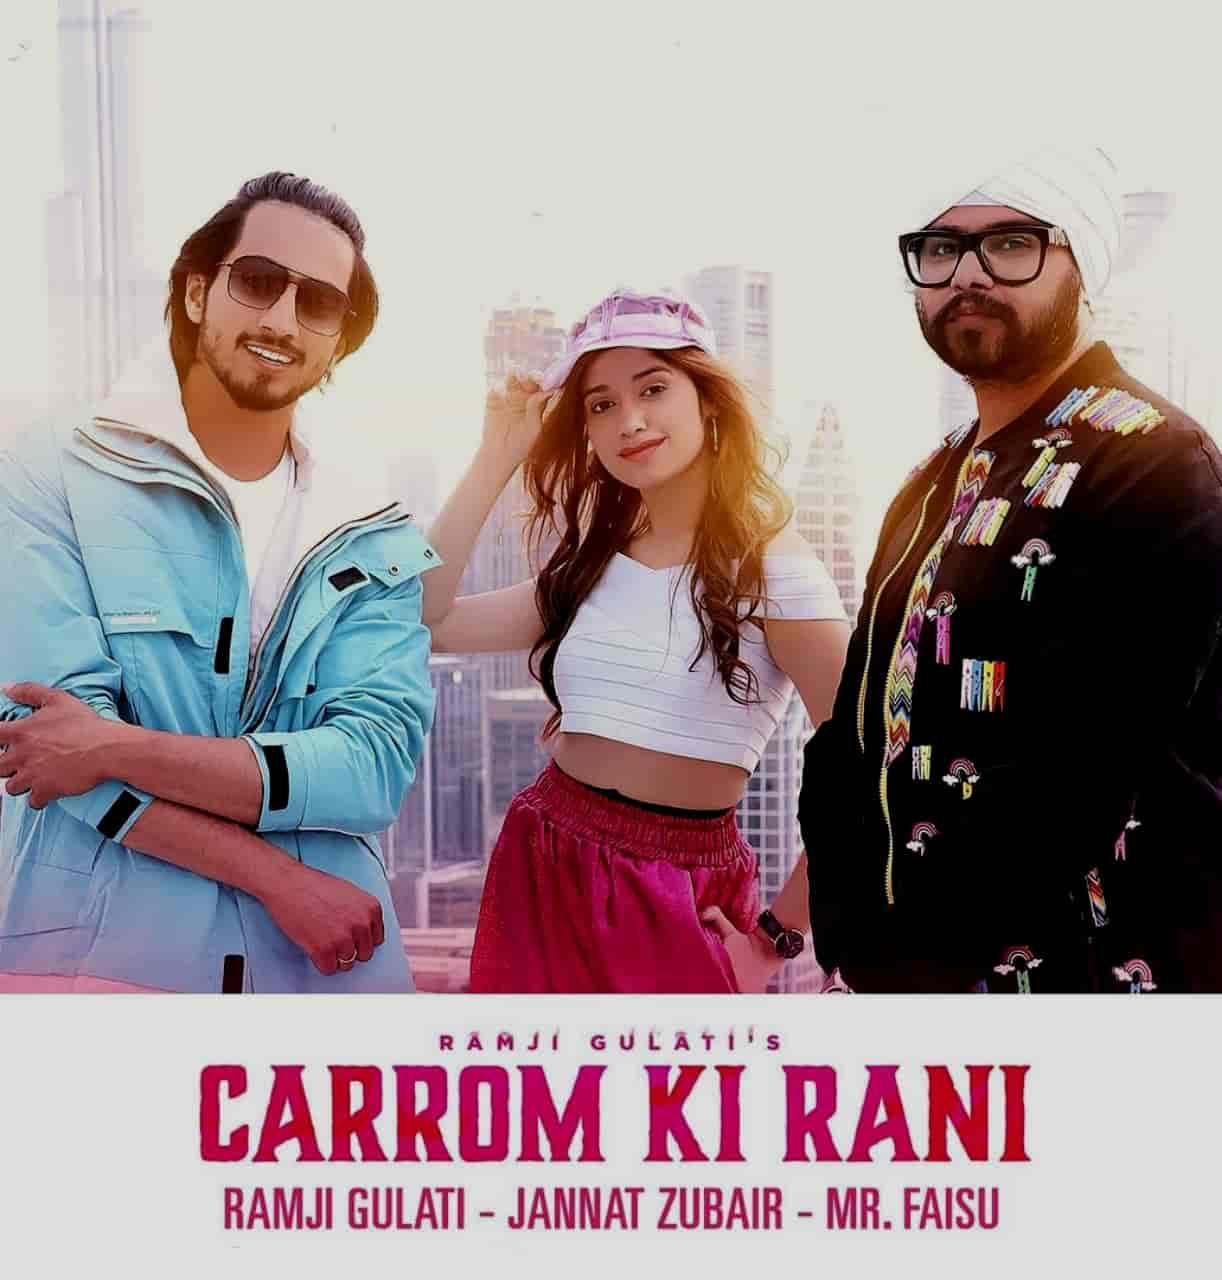 Carrom Ki Rani Song Image Features Jannat Zubair And Mr. Faisu